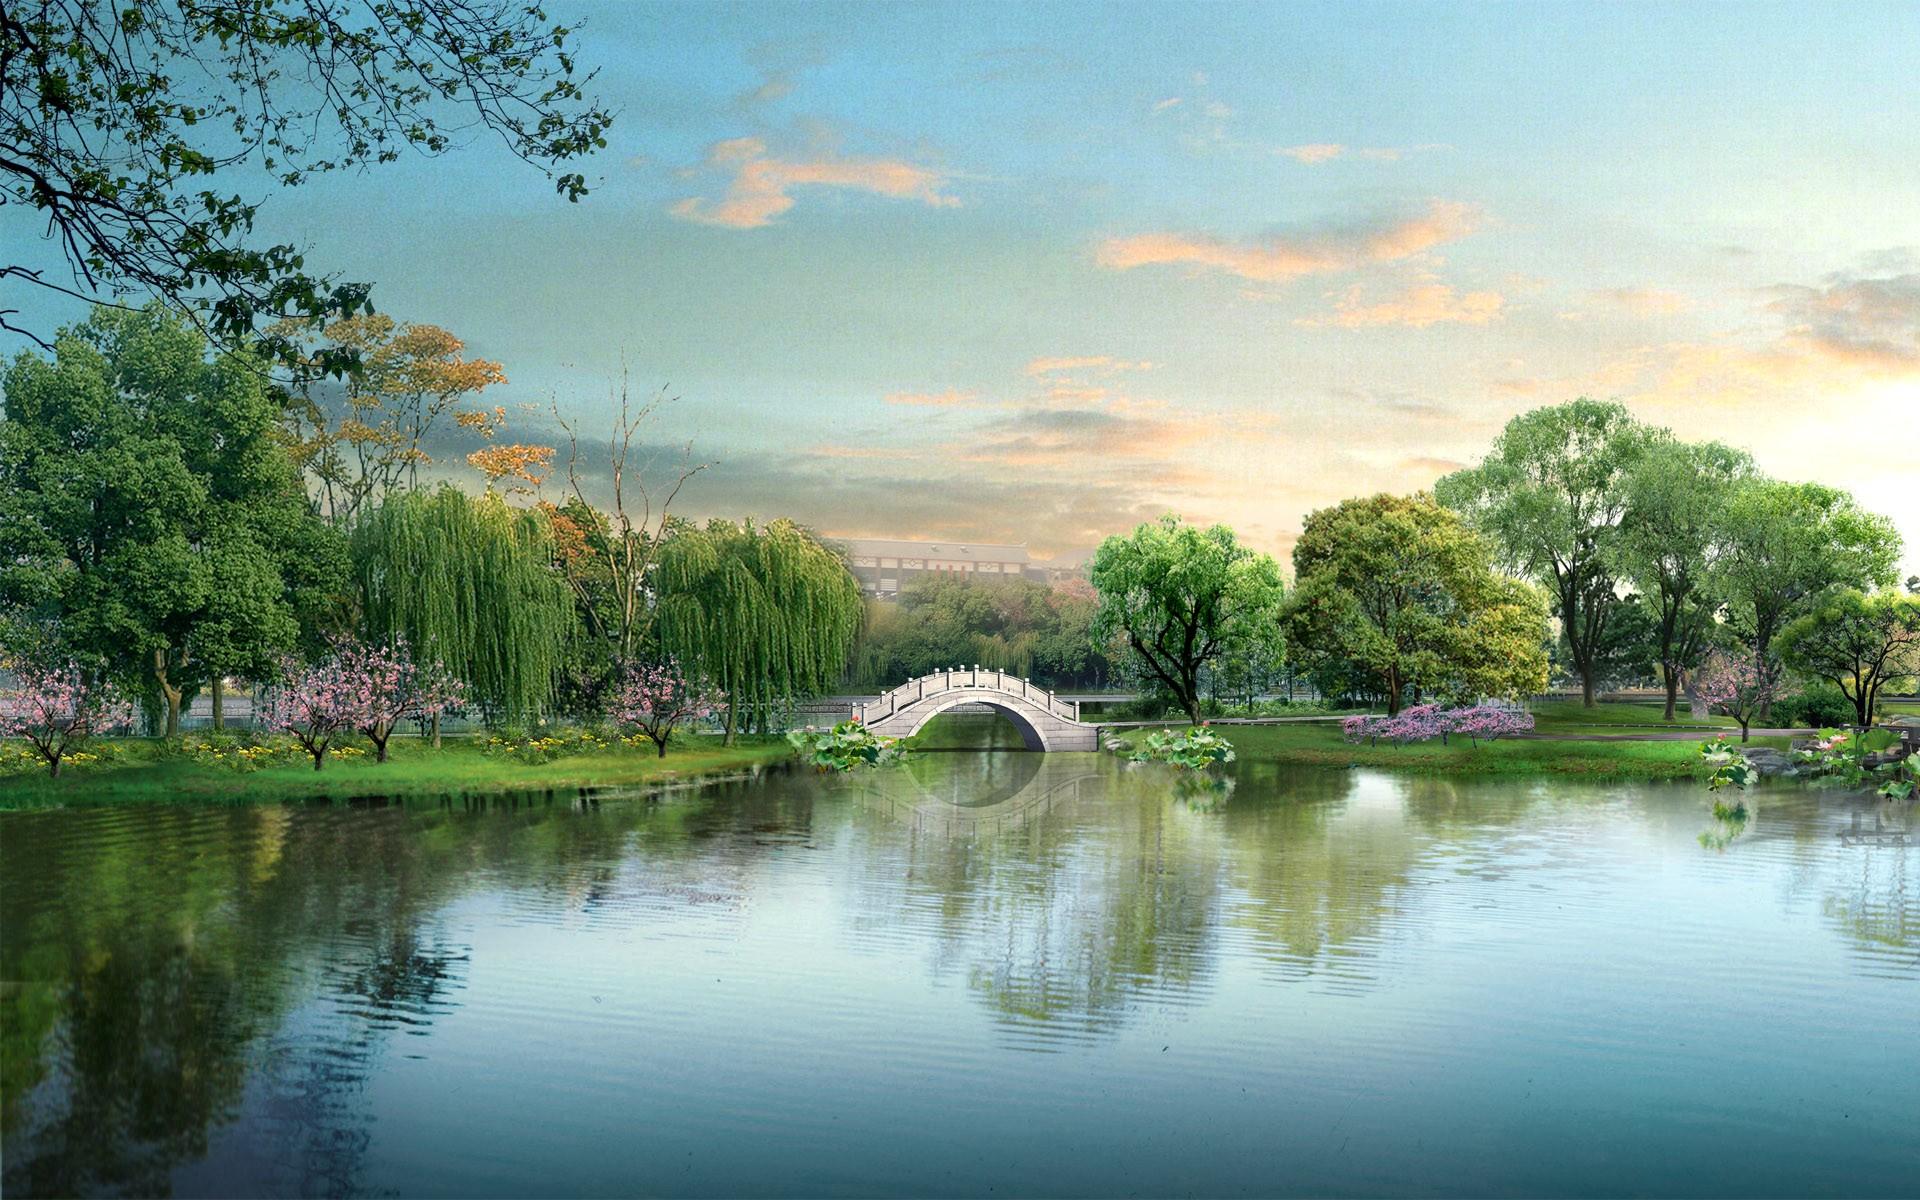 Widescreen Japan Digital Landscape Wallpapers | HD Wallpapers